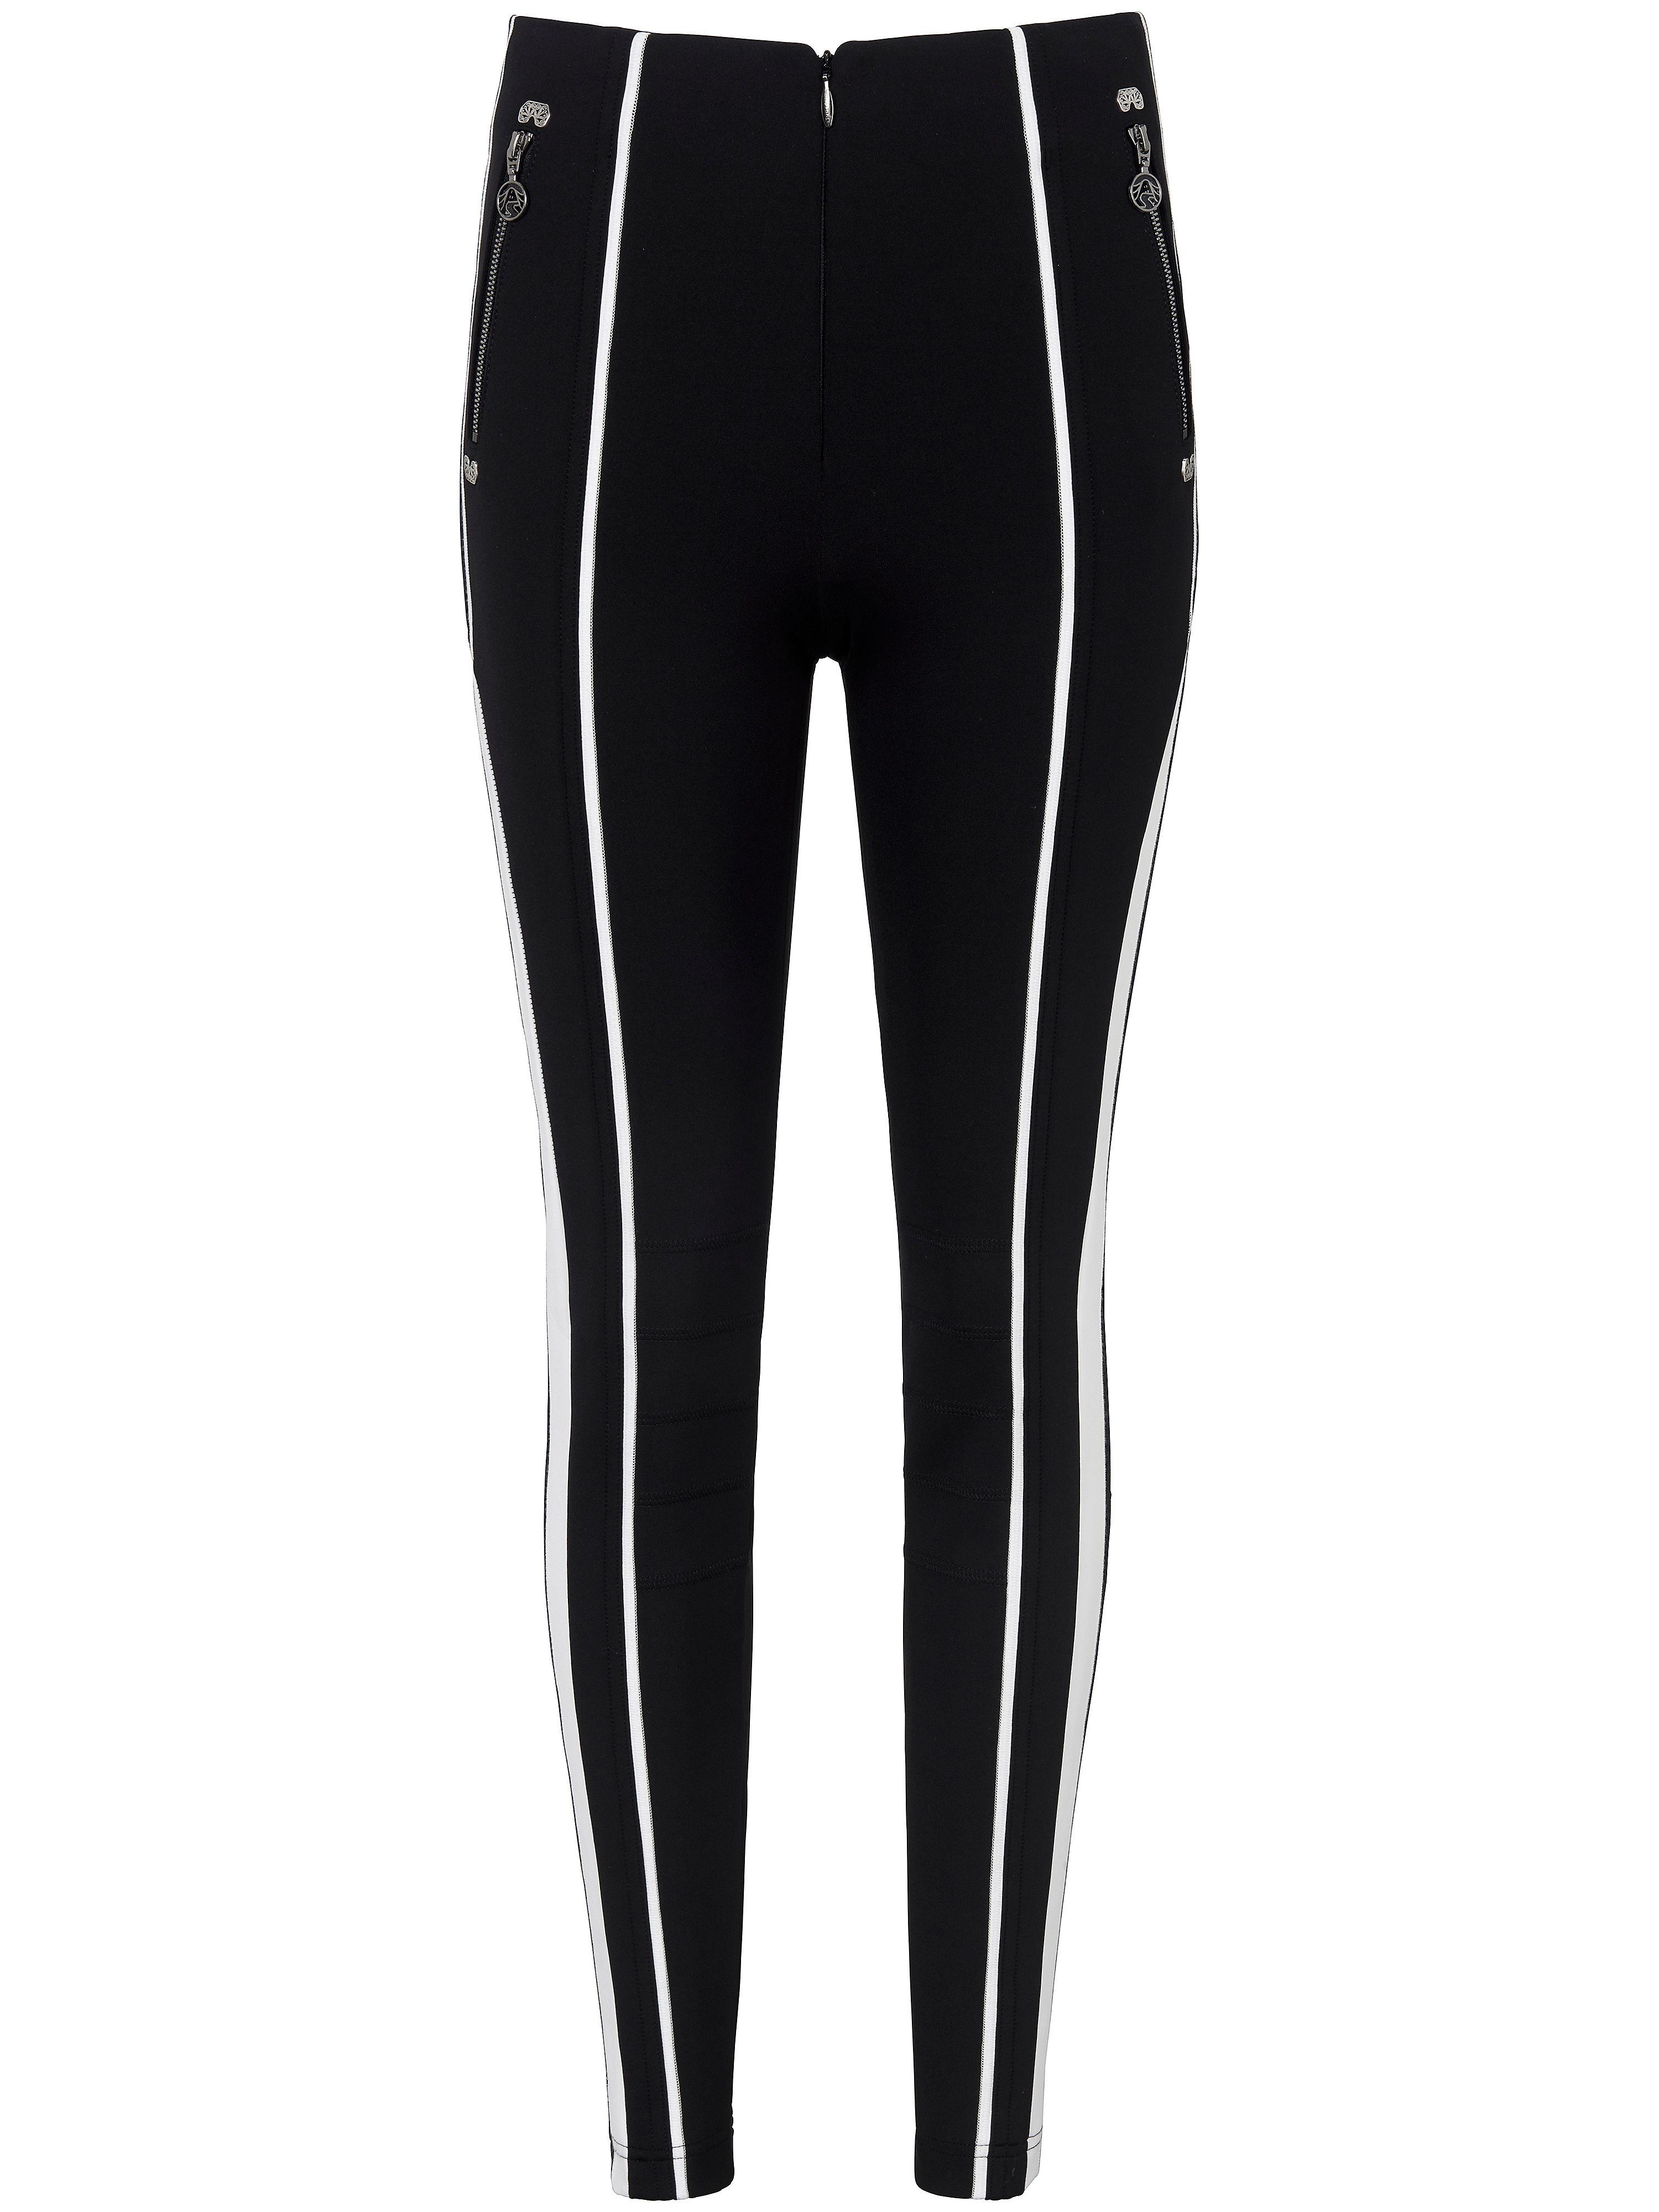 Le pantalon  Sportalm Kitzbühel multicolore taille 48